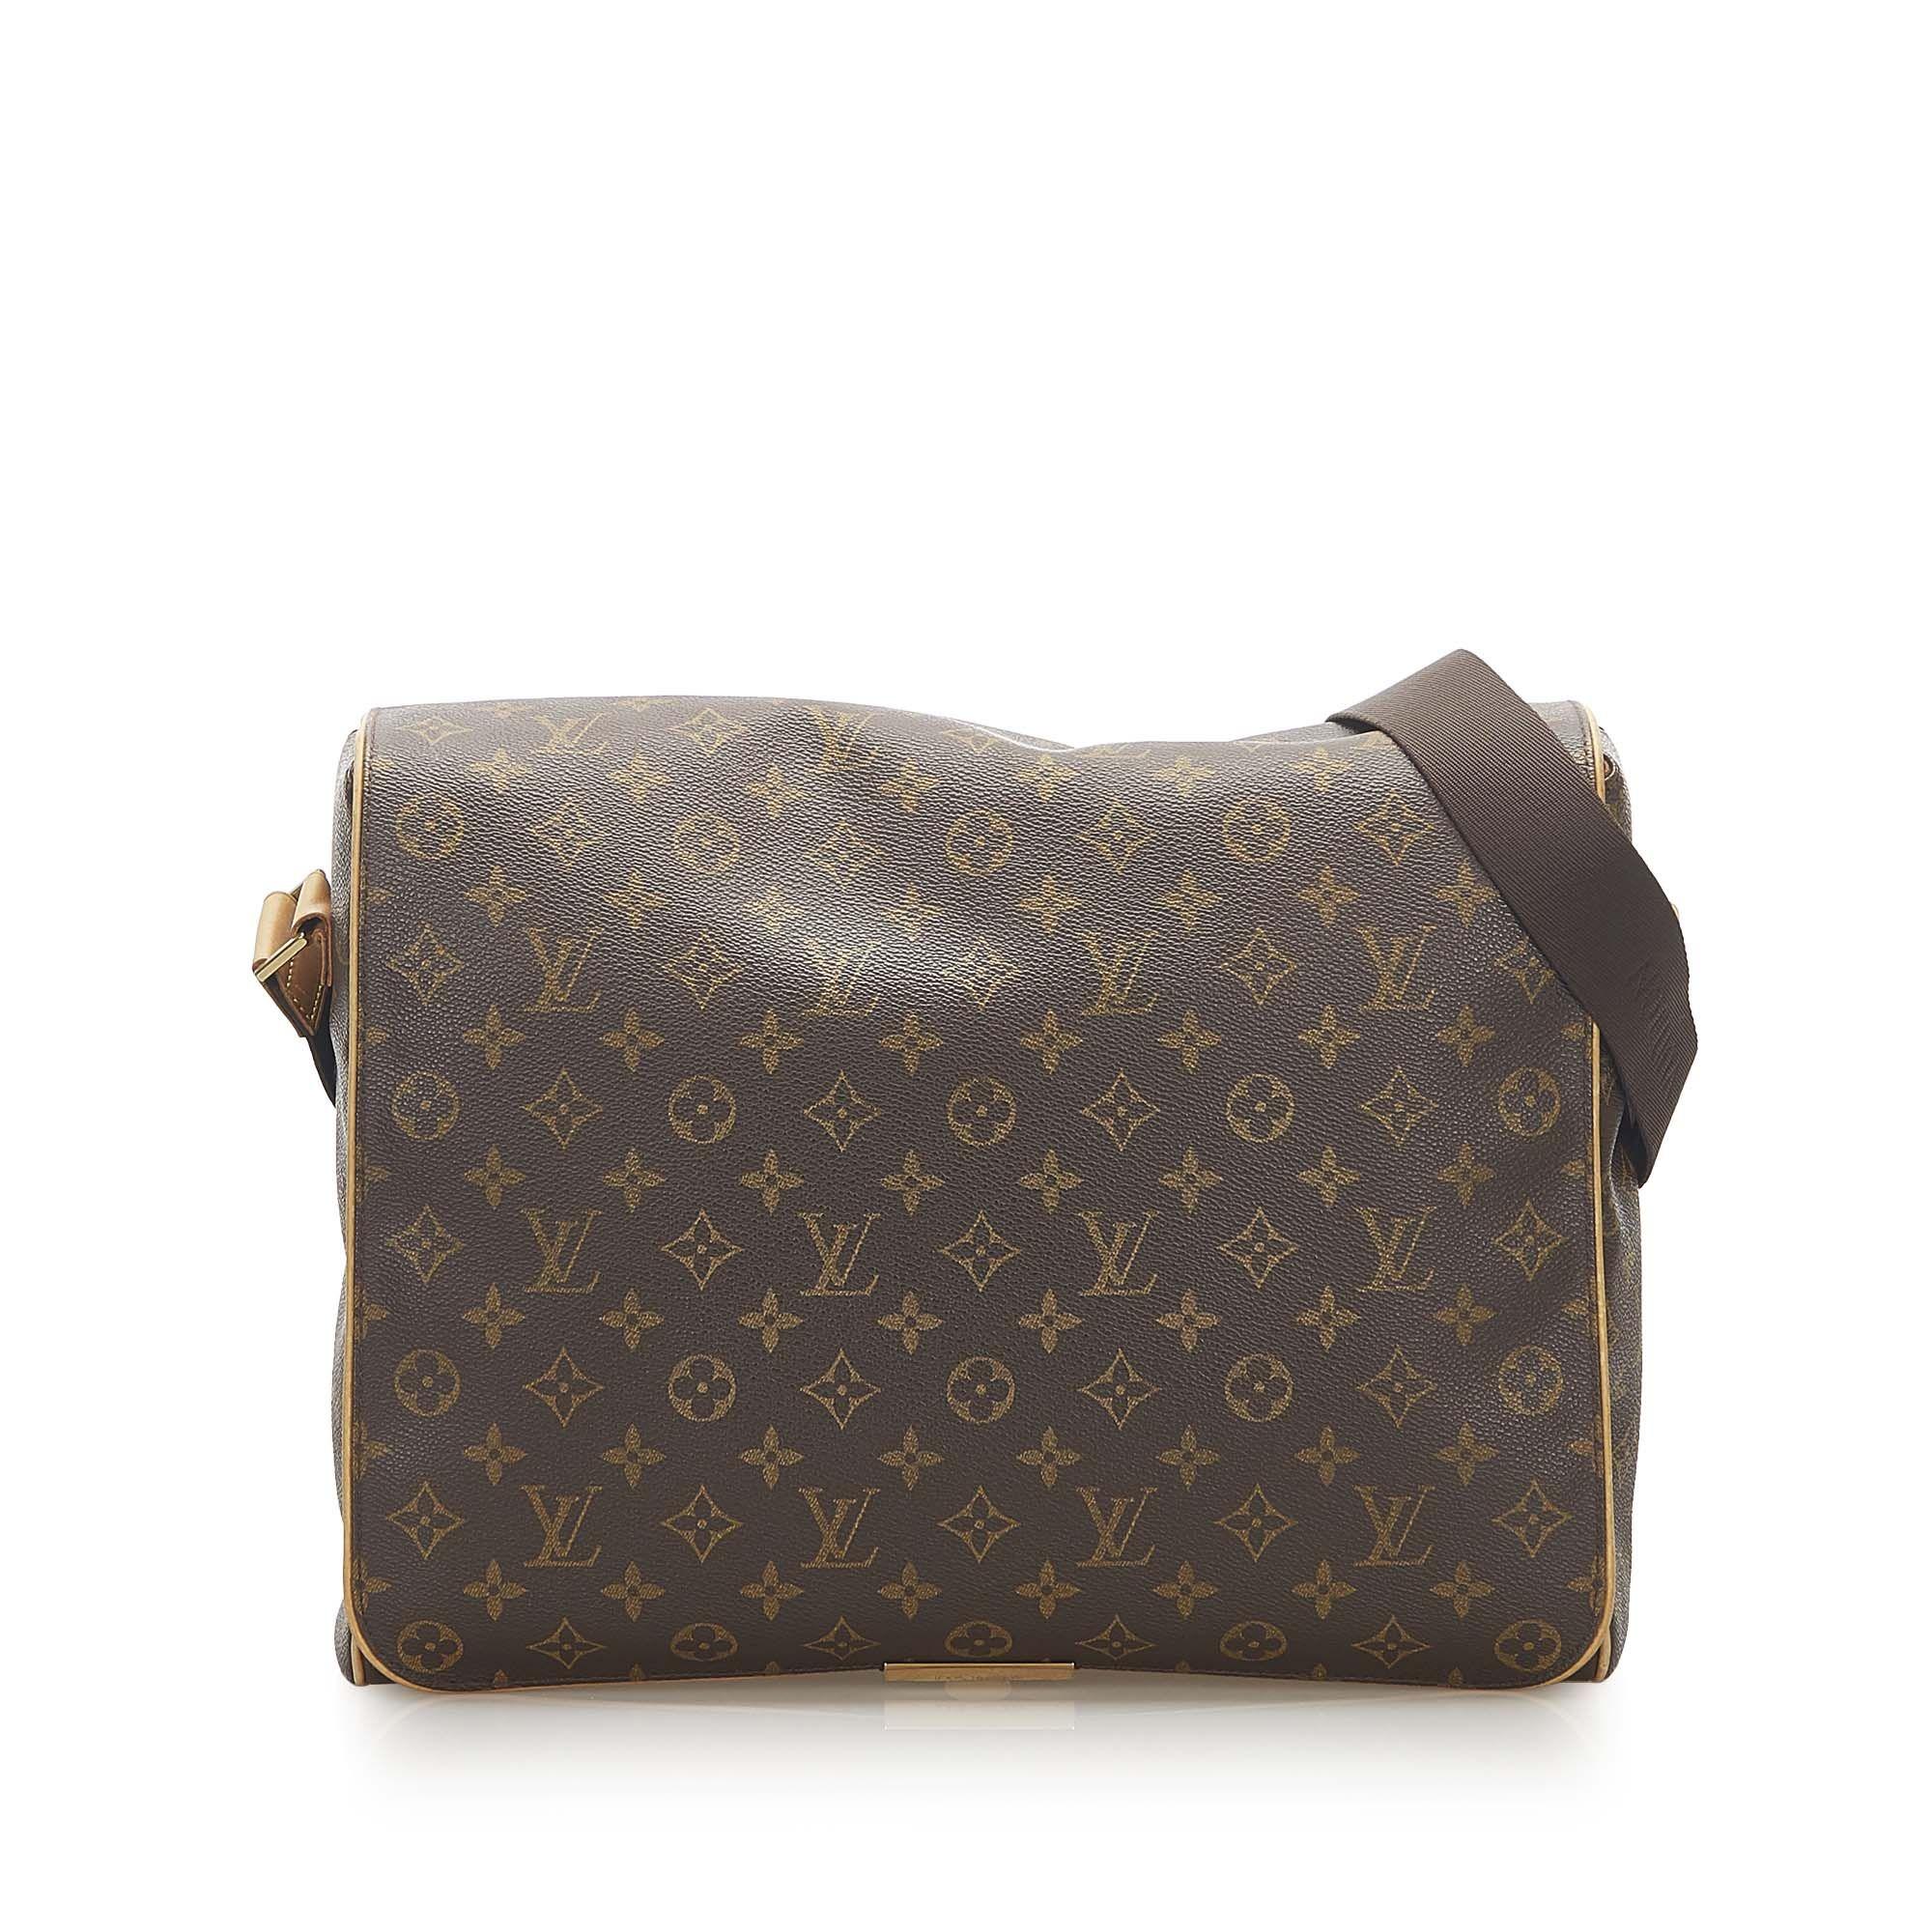 Vintage Louis Vuitton Monogram Abbesses Brown